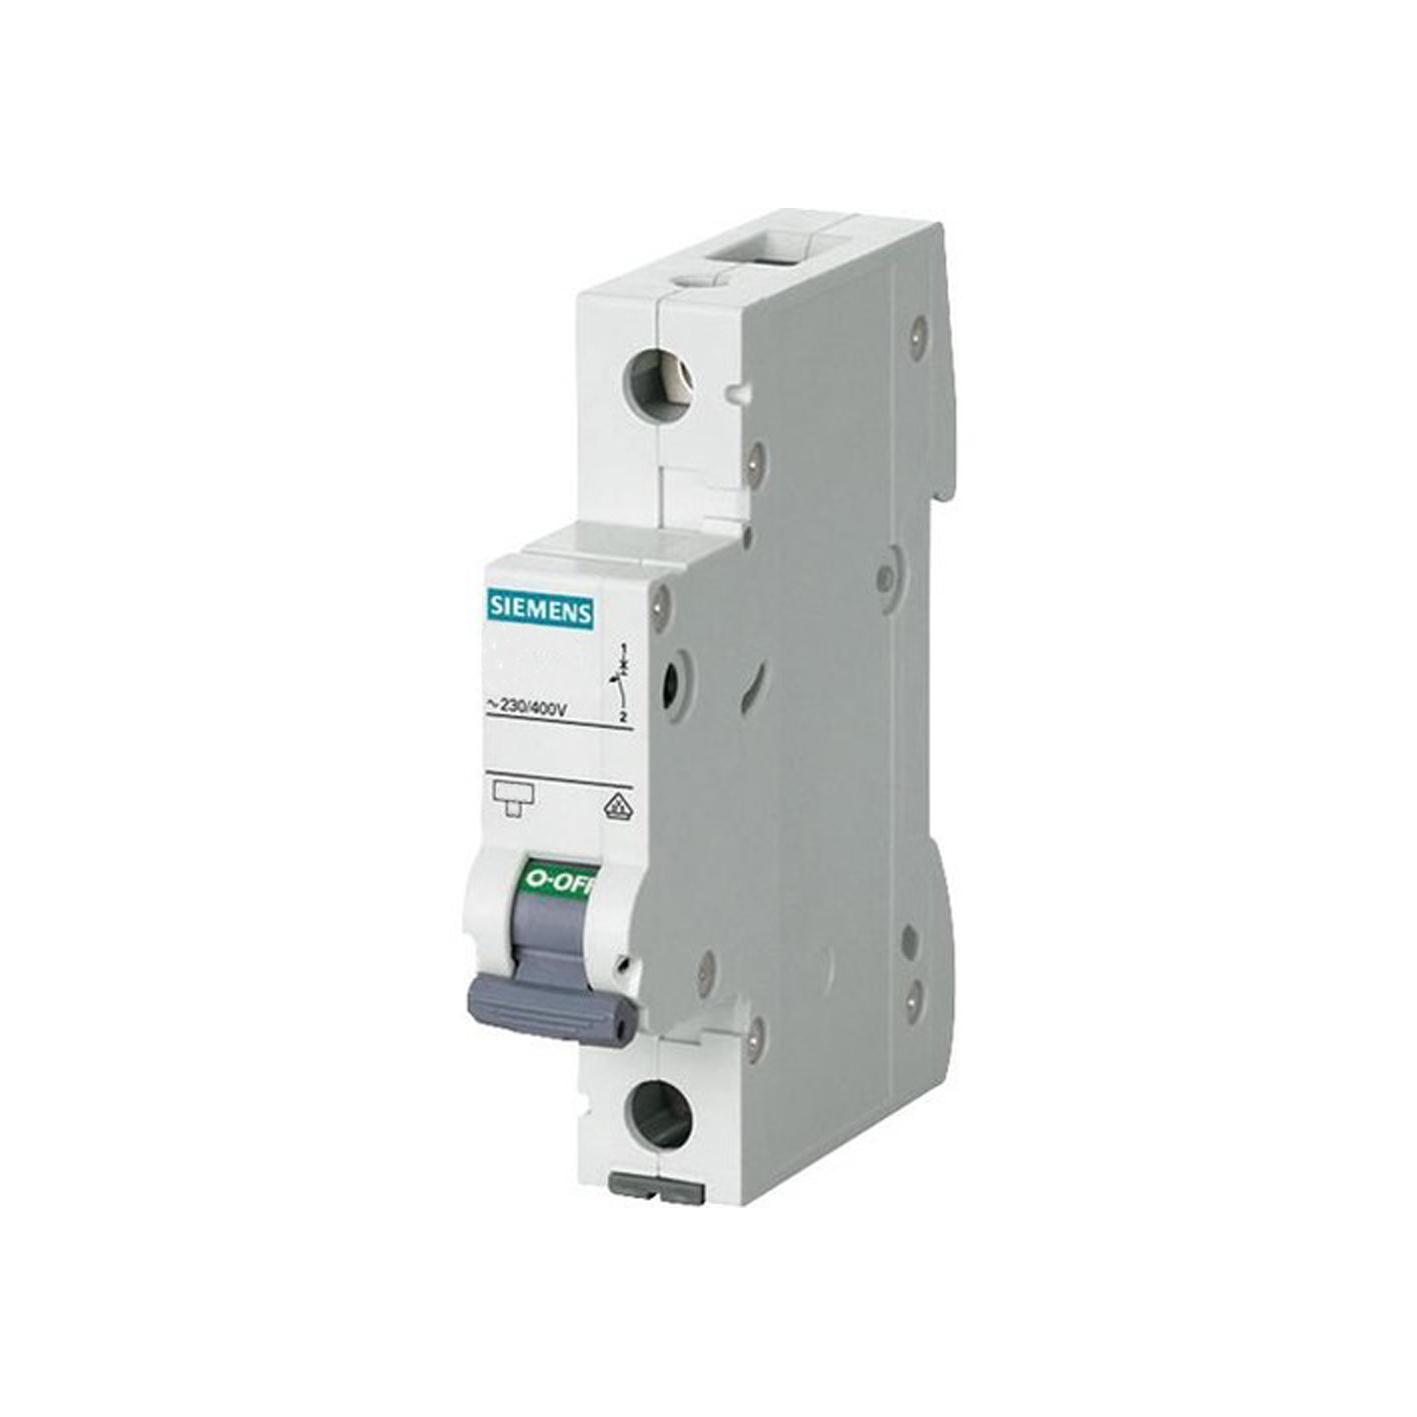 Siemens 1x6A Otomatik Sigorta